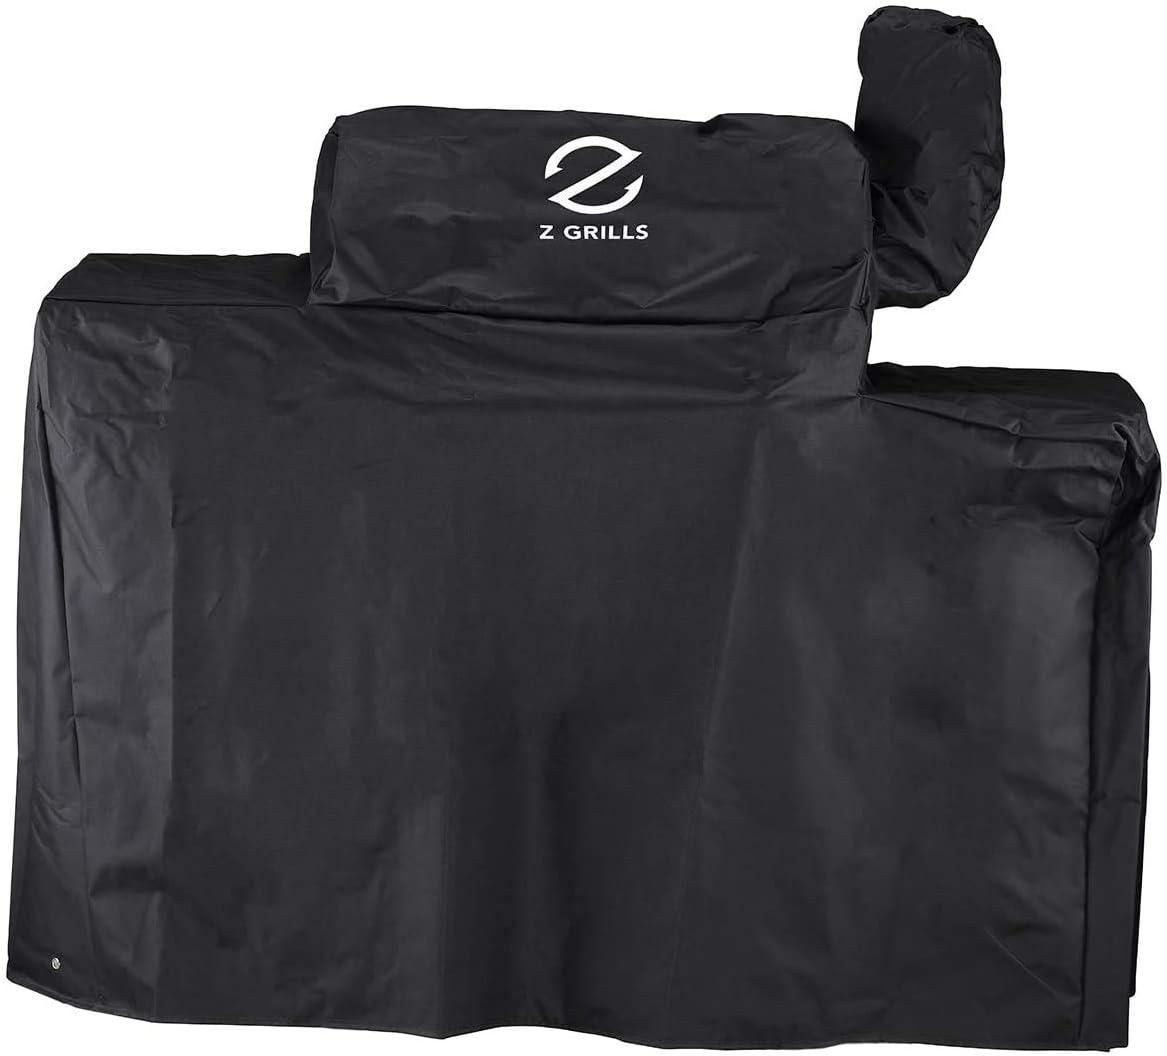 Z GRILLS 直輸入品激安 ZGC-600S お見舞い BBQ Grill Cover Black